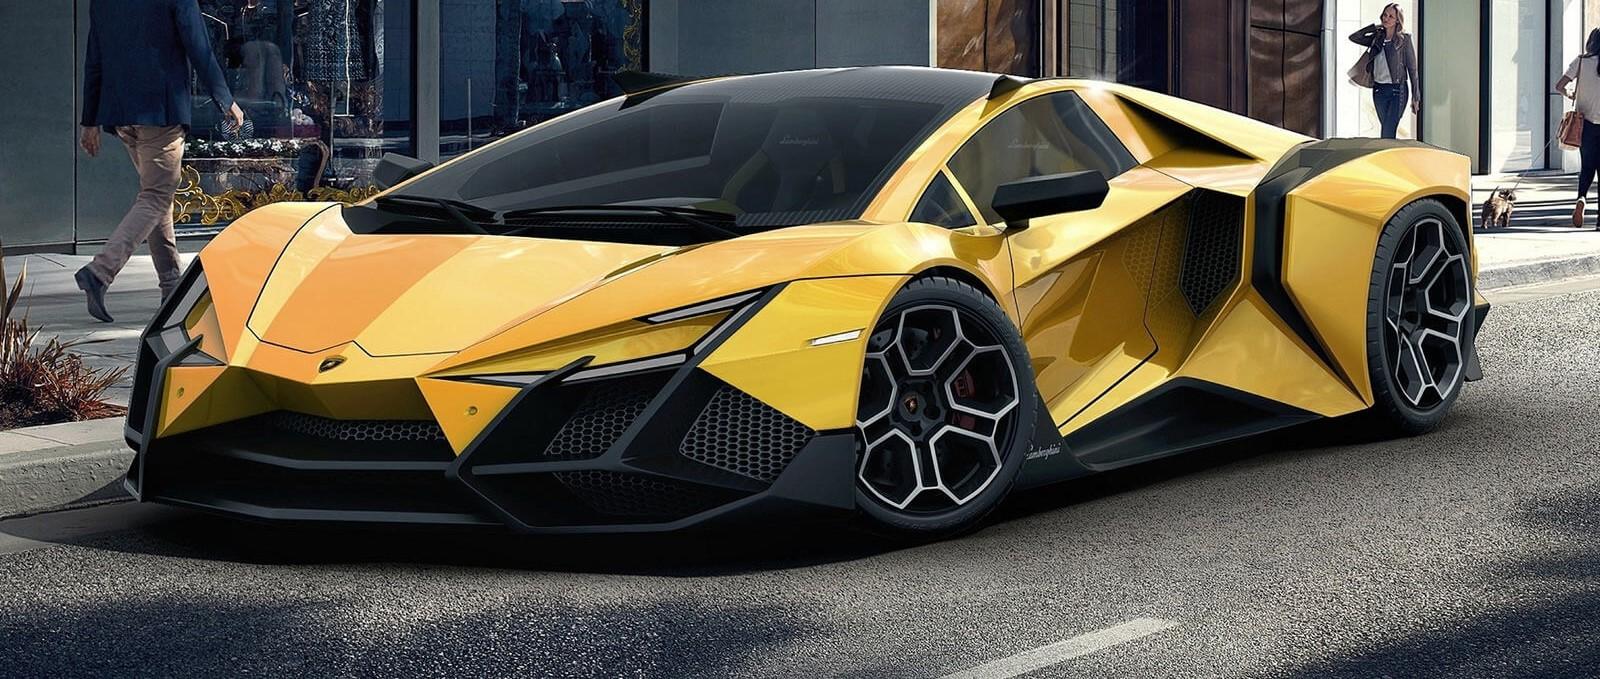 Meet The Crazy Lamborghini It S Amazing And We Like It